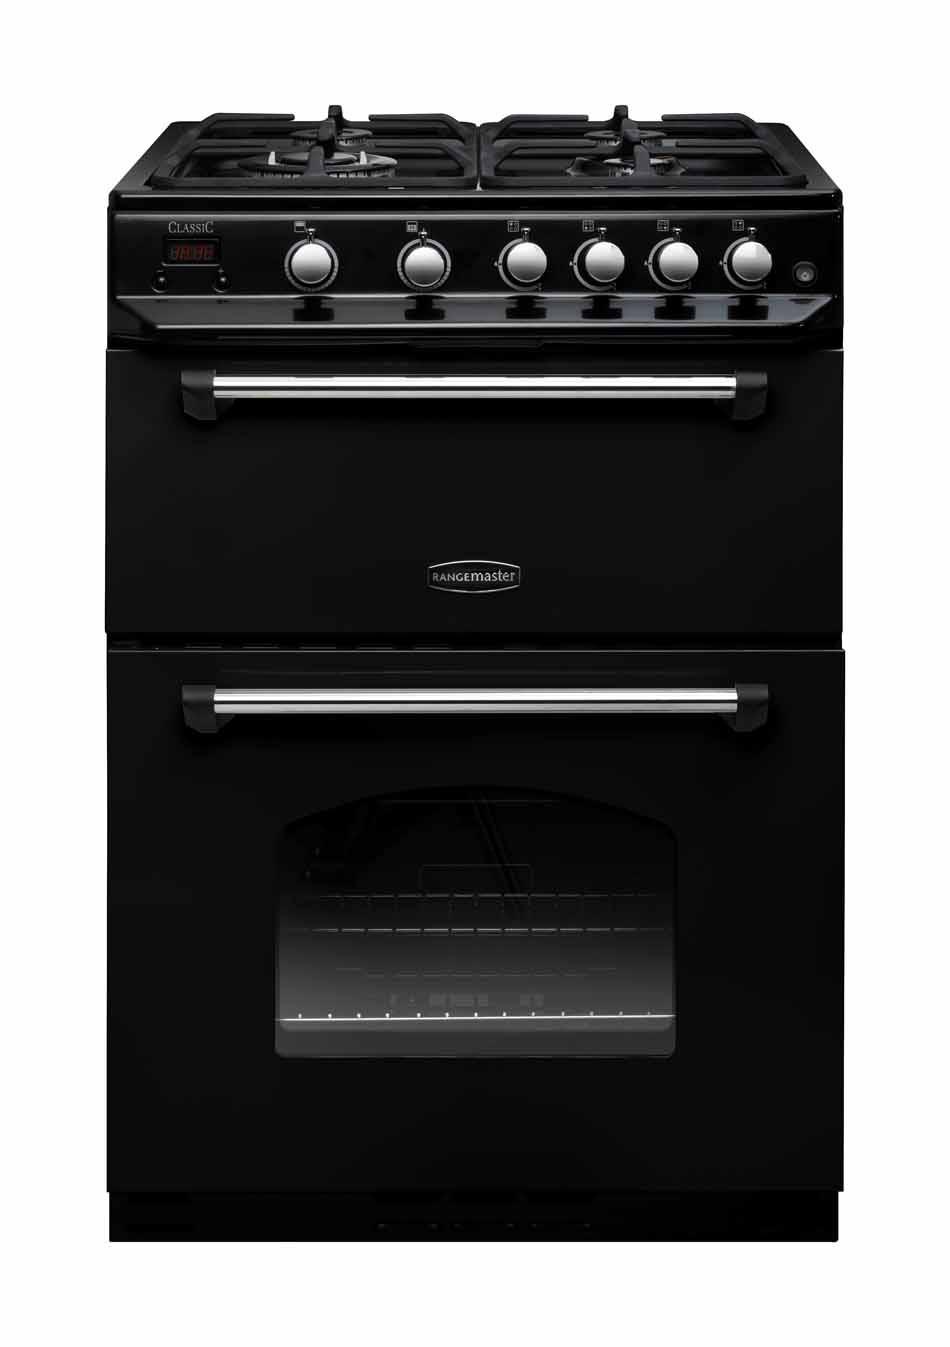 Rangemaster Classic 60 Gas Range Cooker Black/Chrome Trim